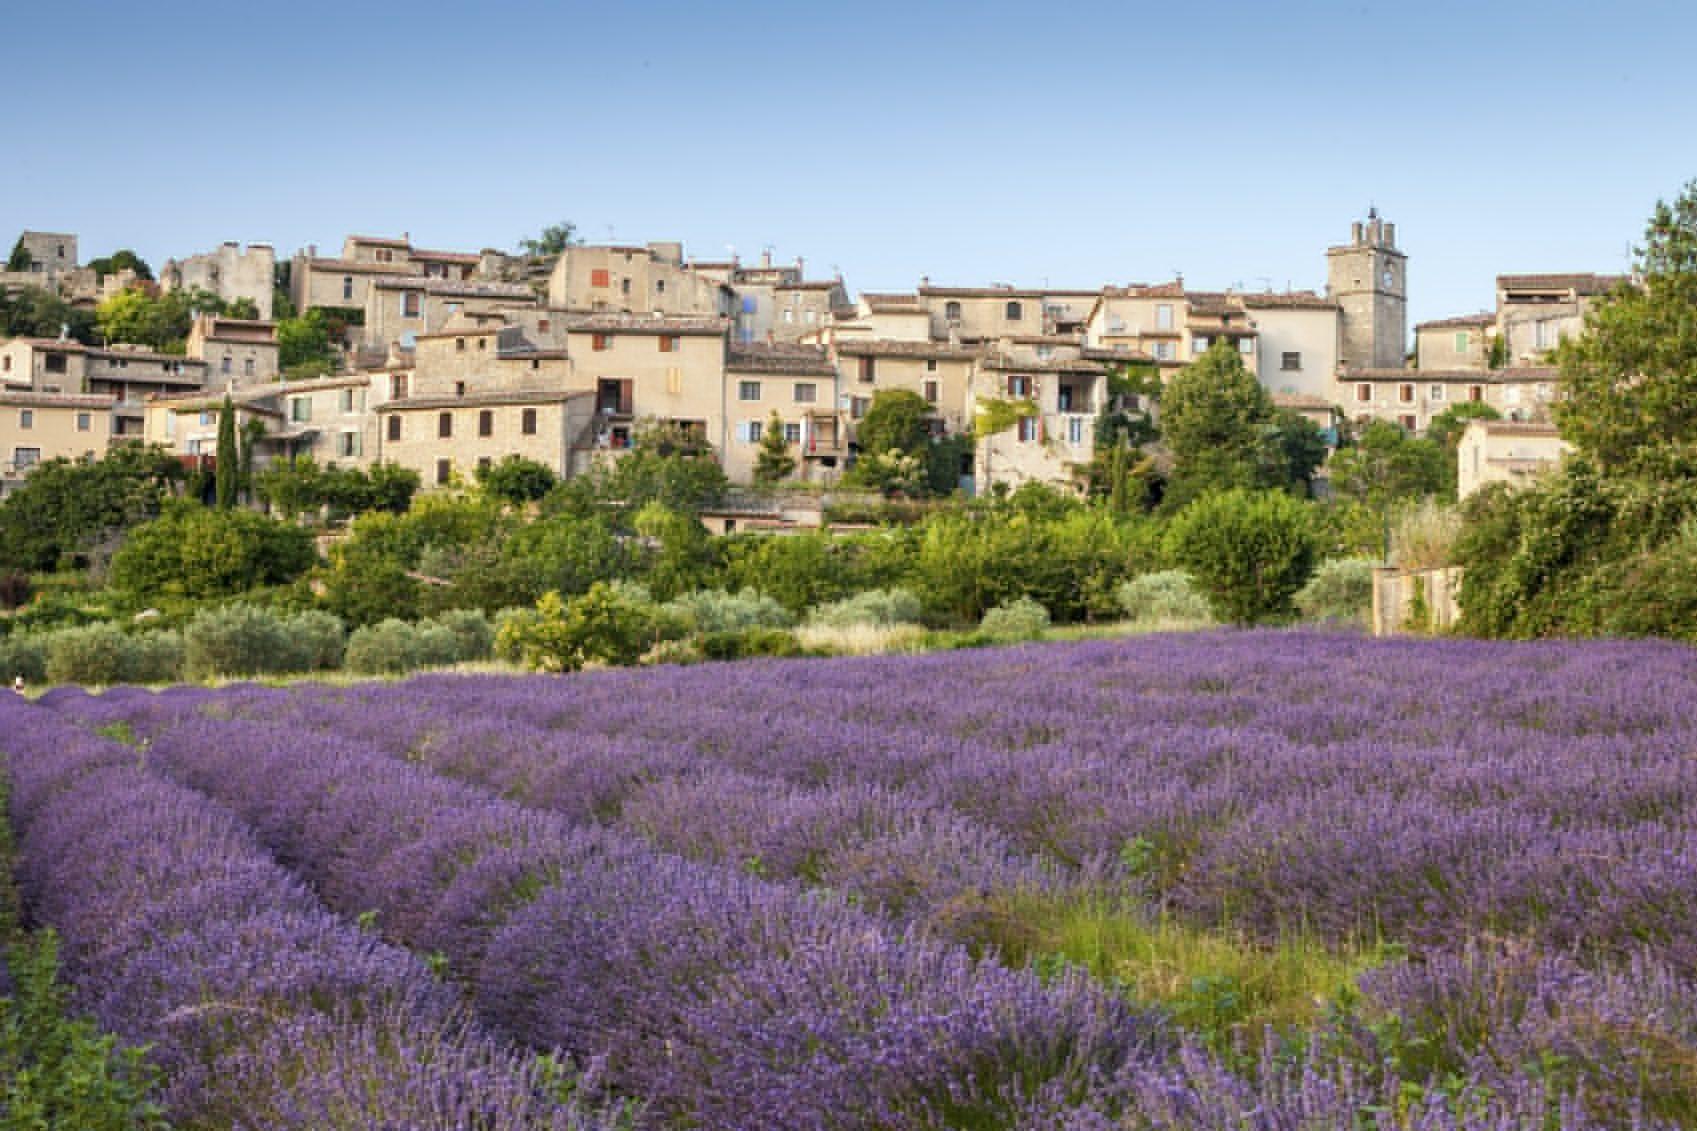 Saignon village, Vaucluse region, Provence, France